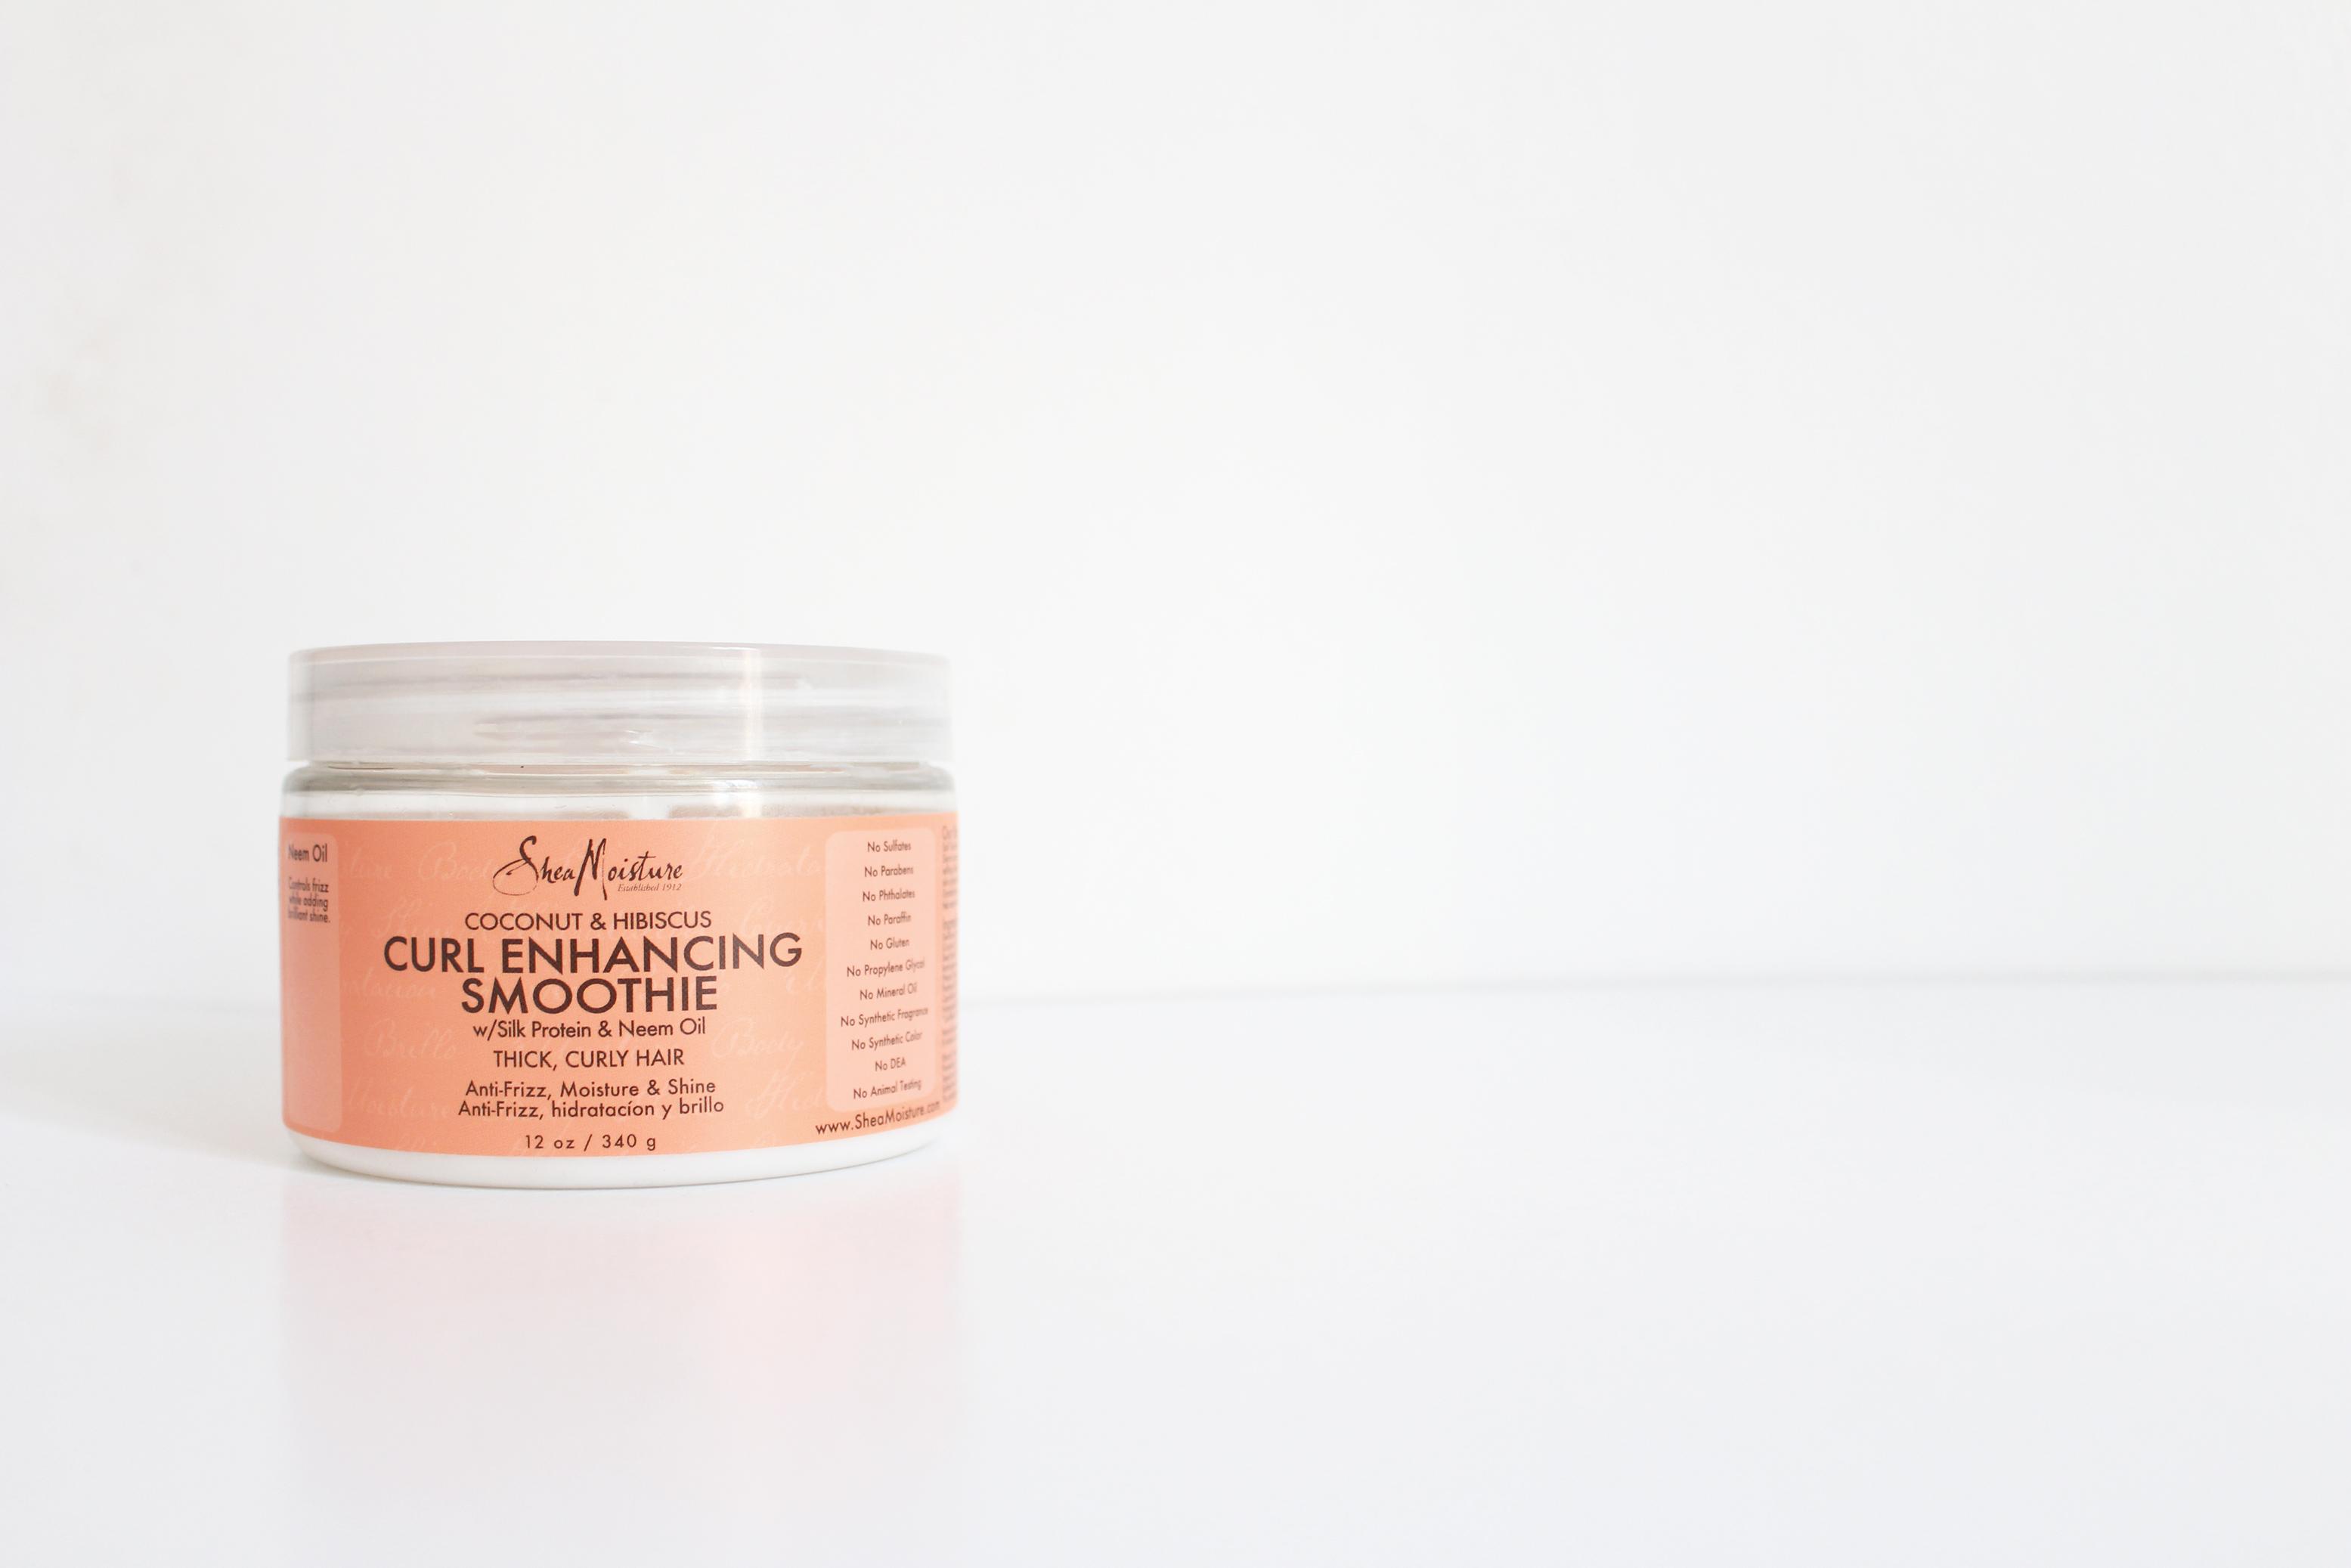 curl enhancing smoothie shea moisture